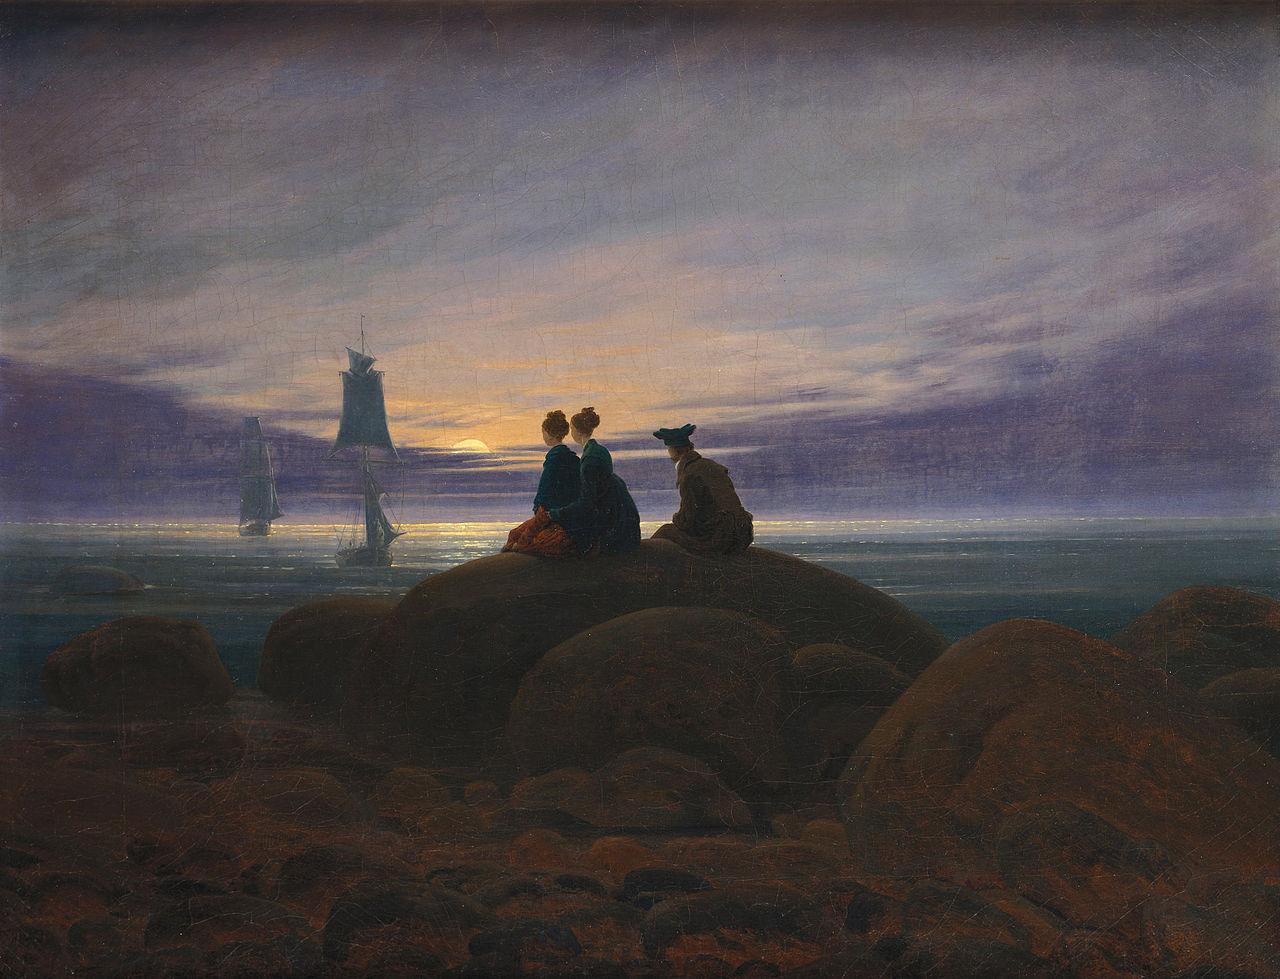 Archivo:Caspar David Friedrich - Mondaufgang am Meer - Google Art Project.jpg - Wikipedia, la enciclopedia libre